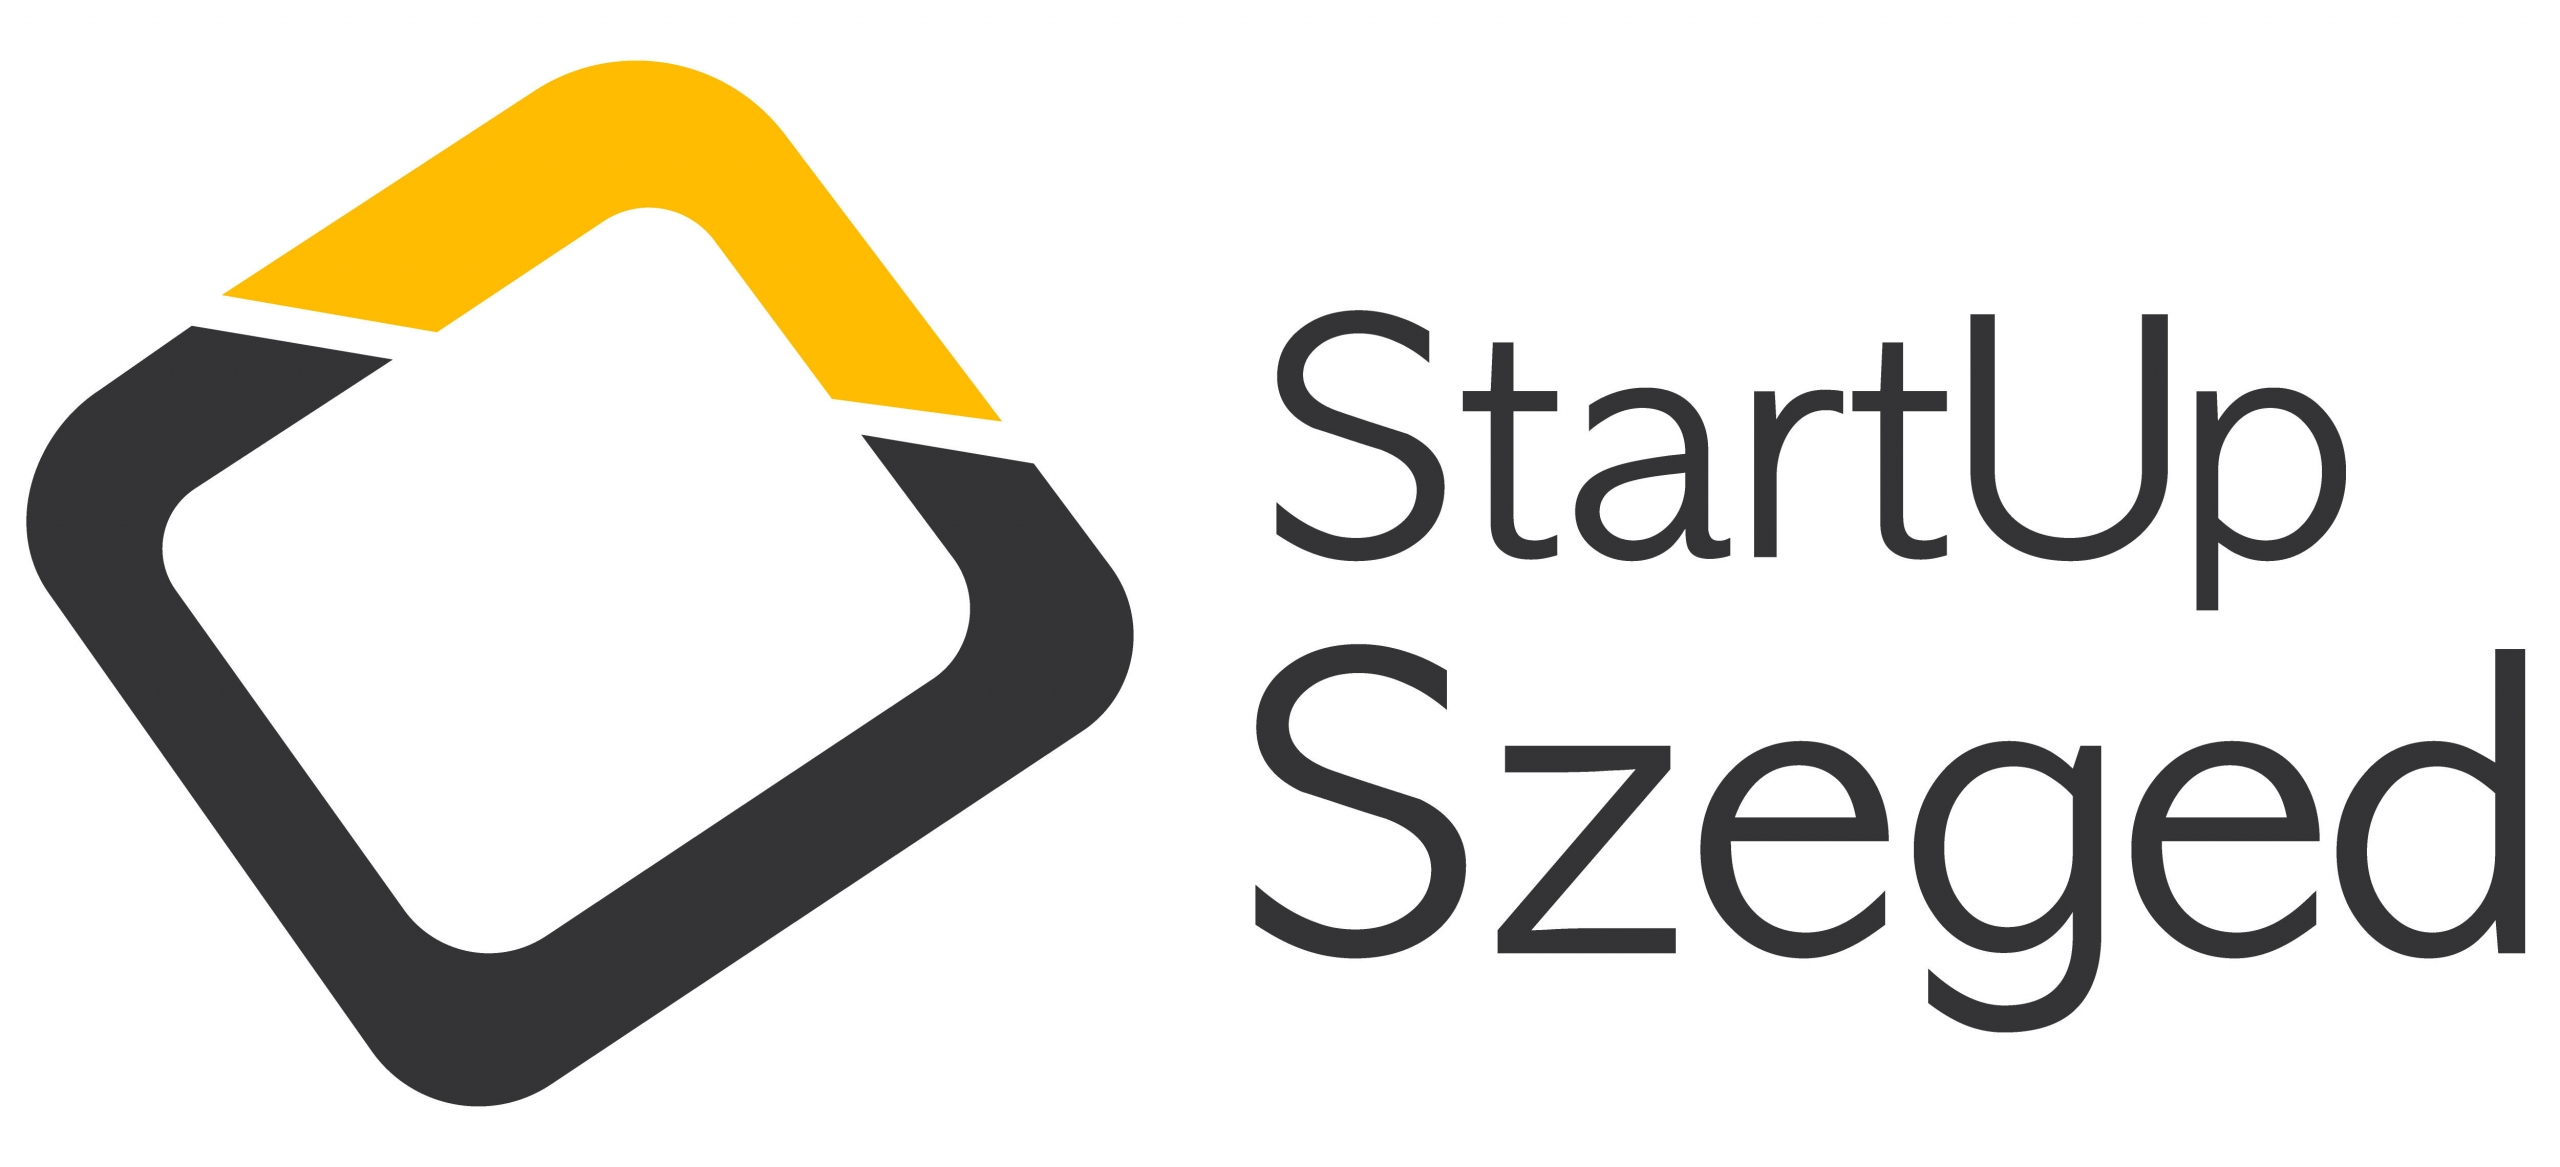 Startup Szeged